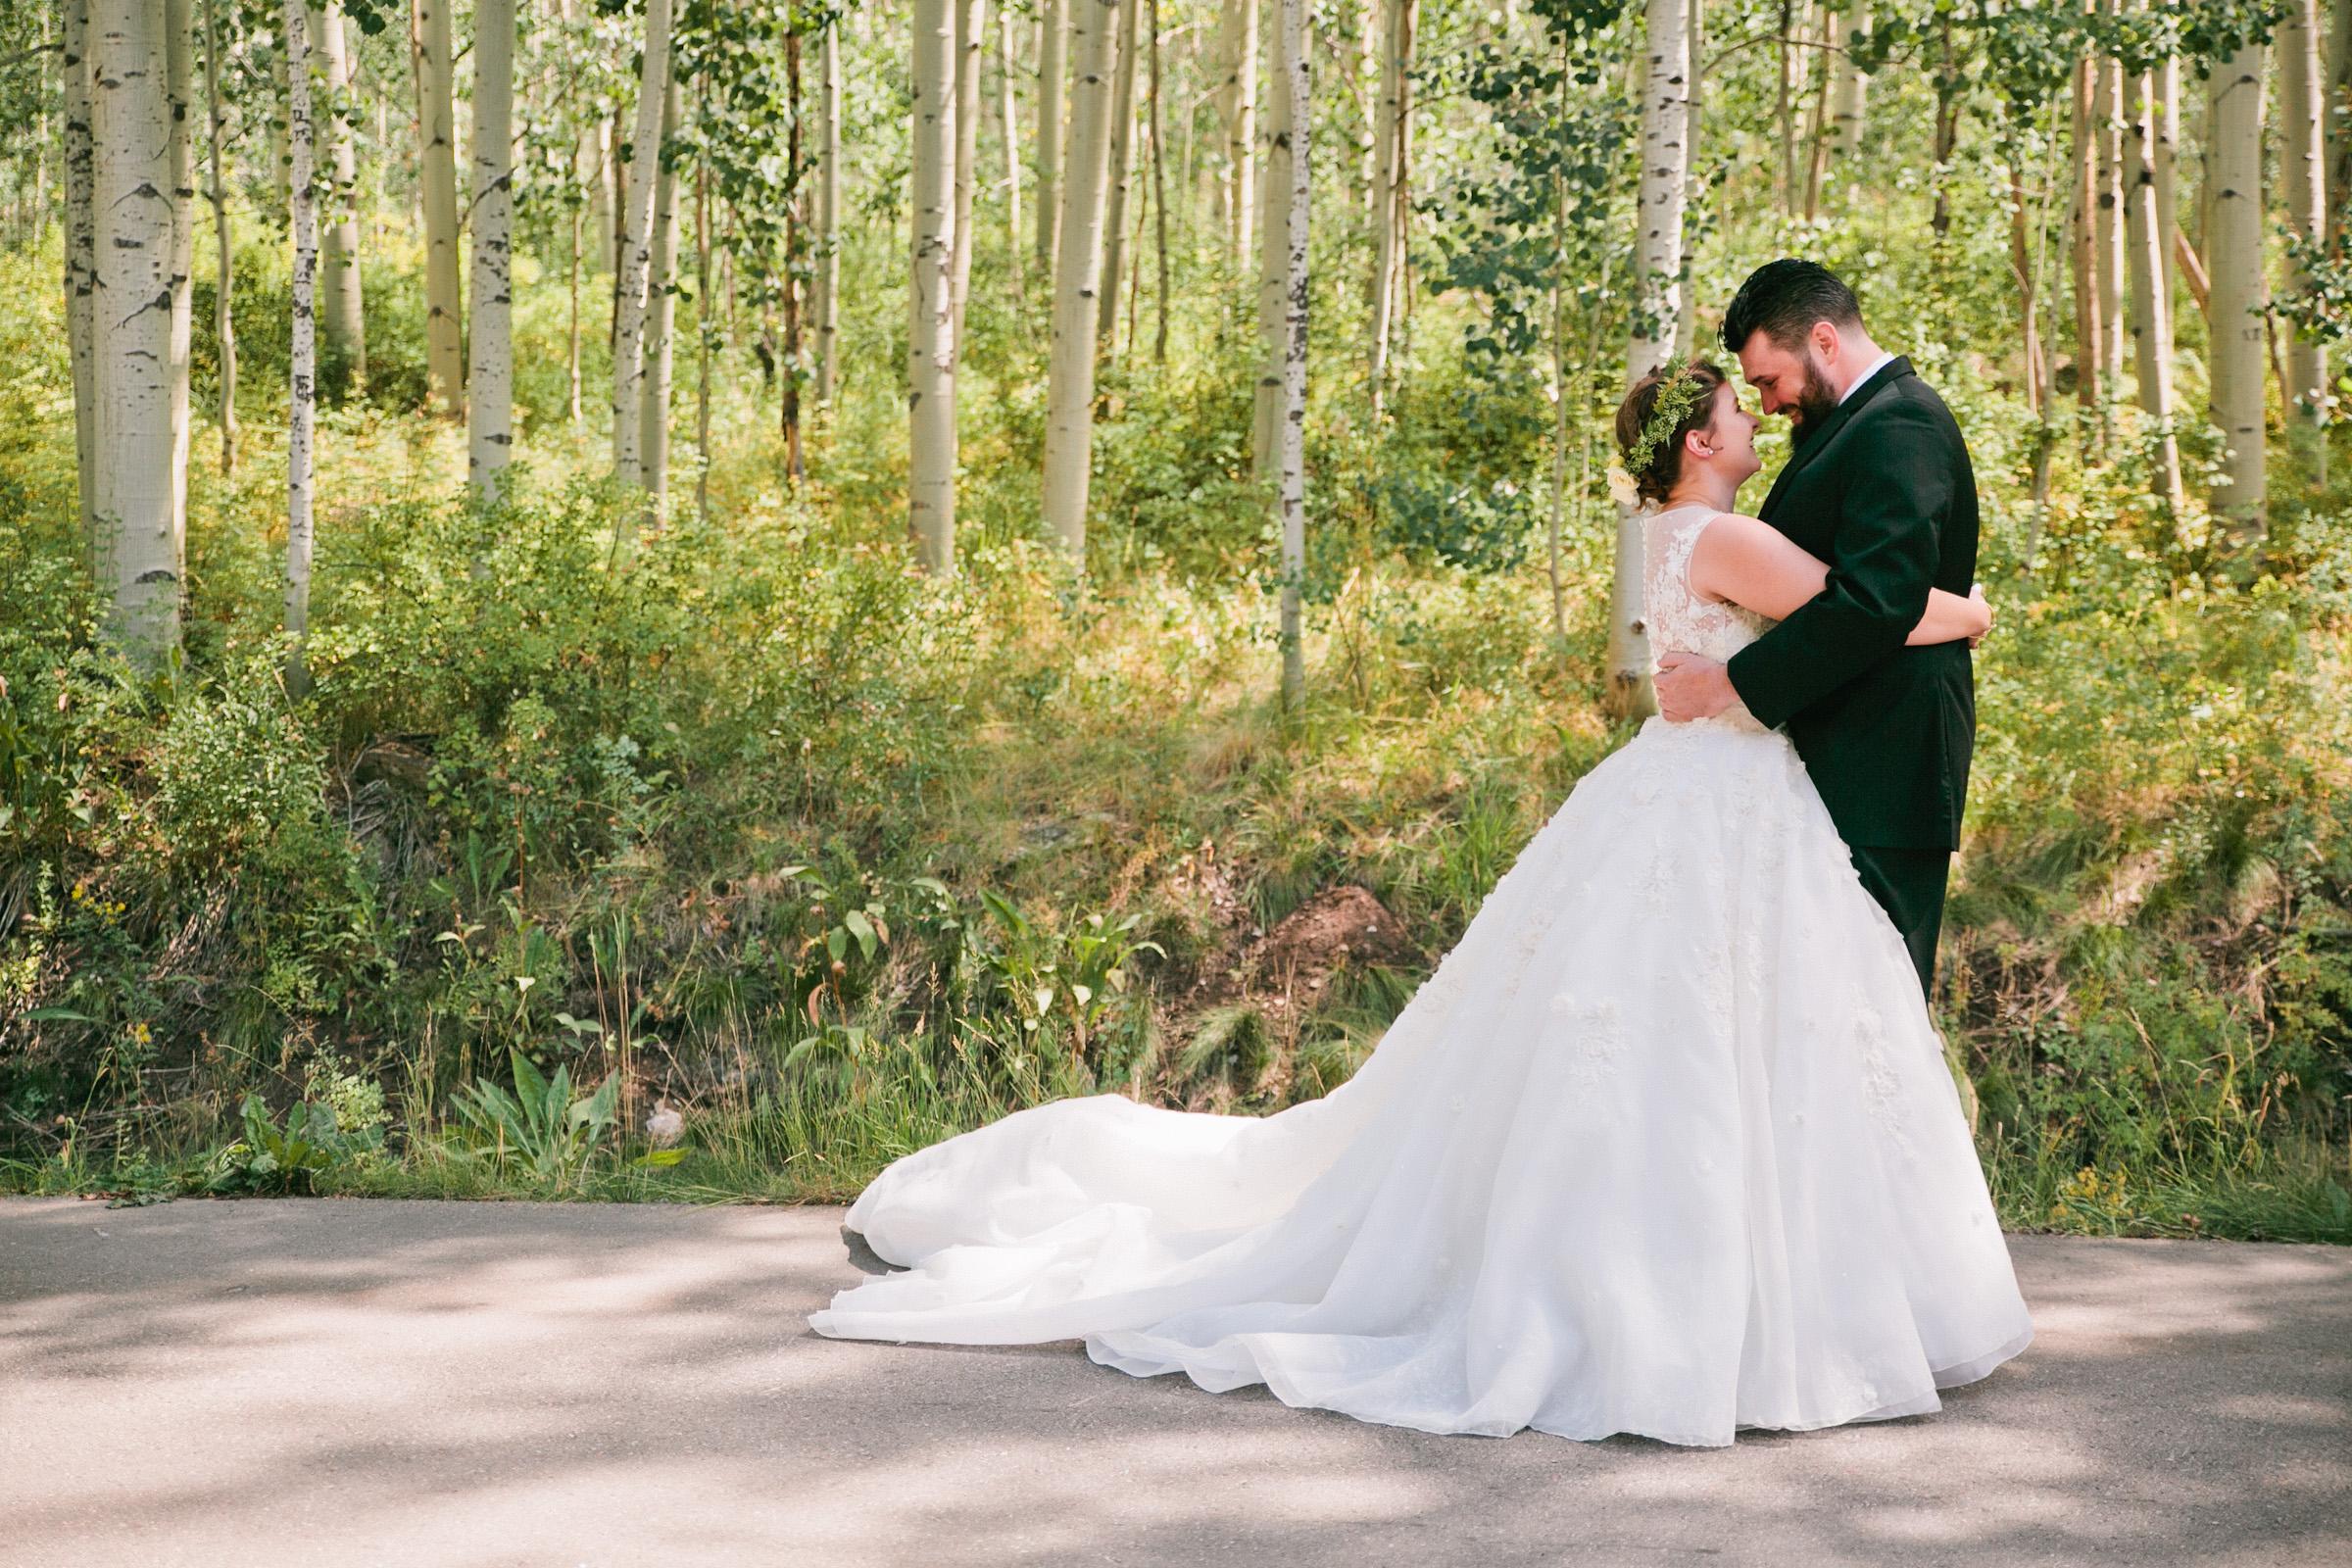 first_look_vail_colorado_wedding_venues_mountains02